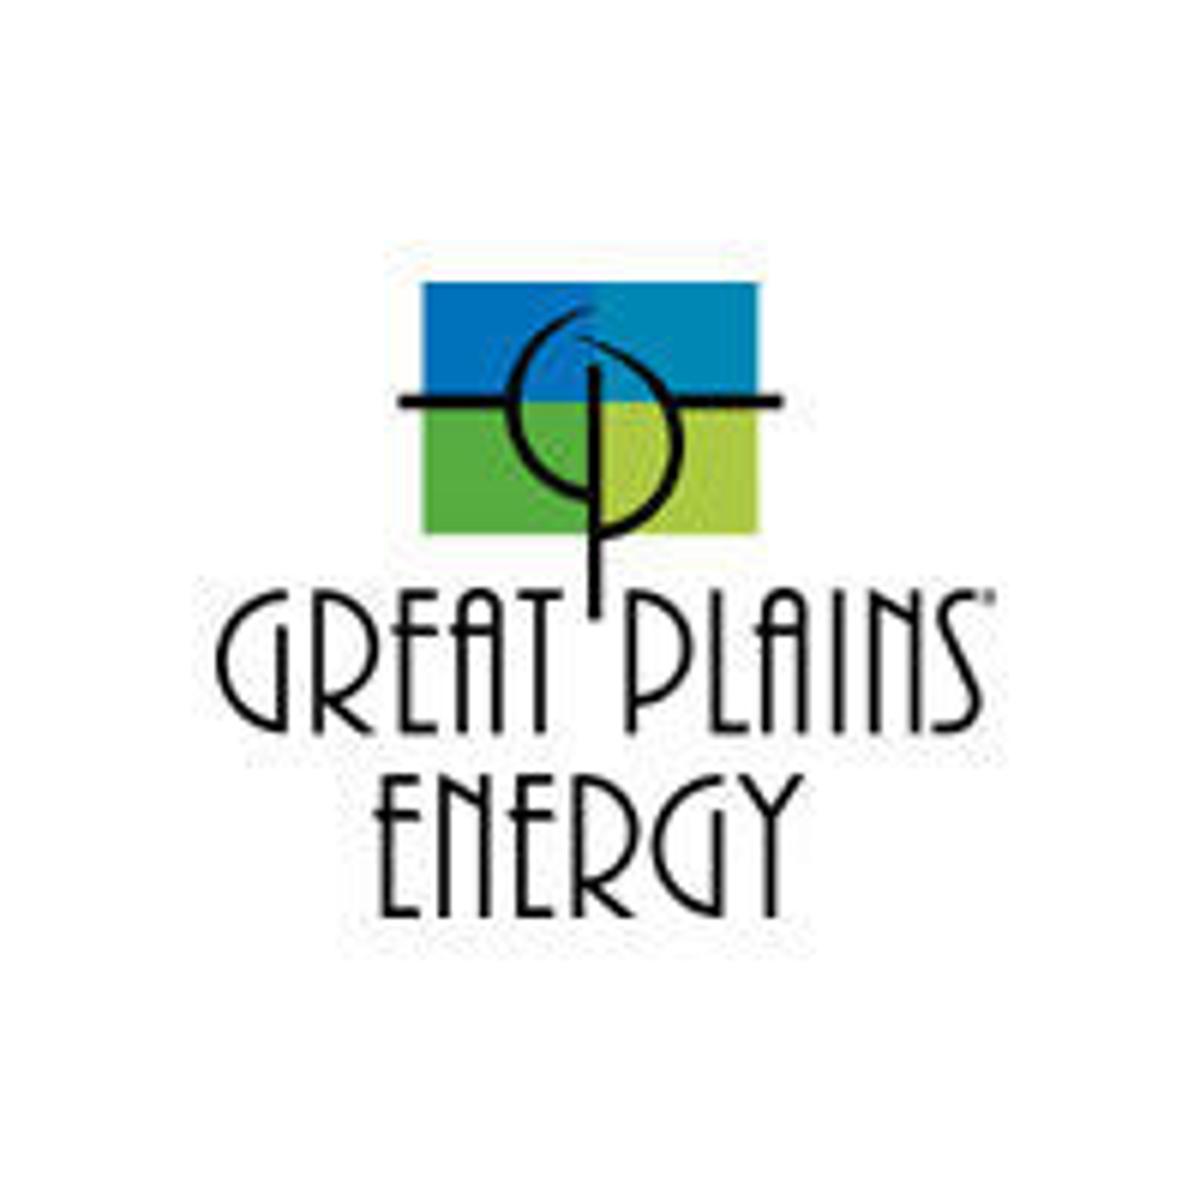 Great Plains Energy logo